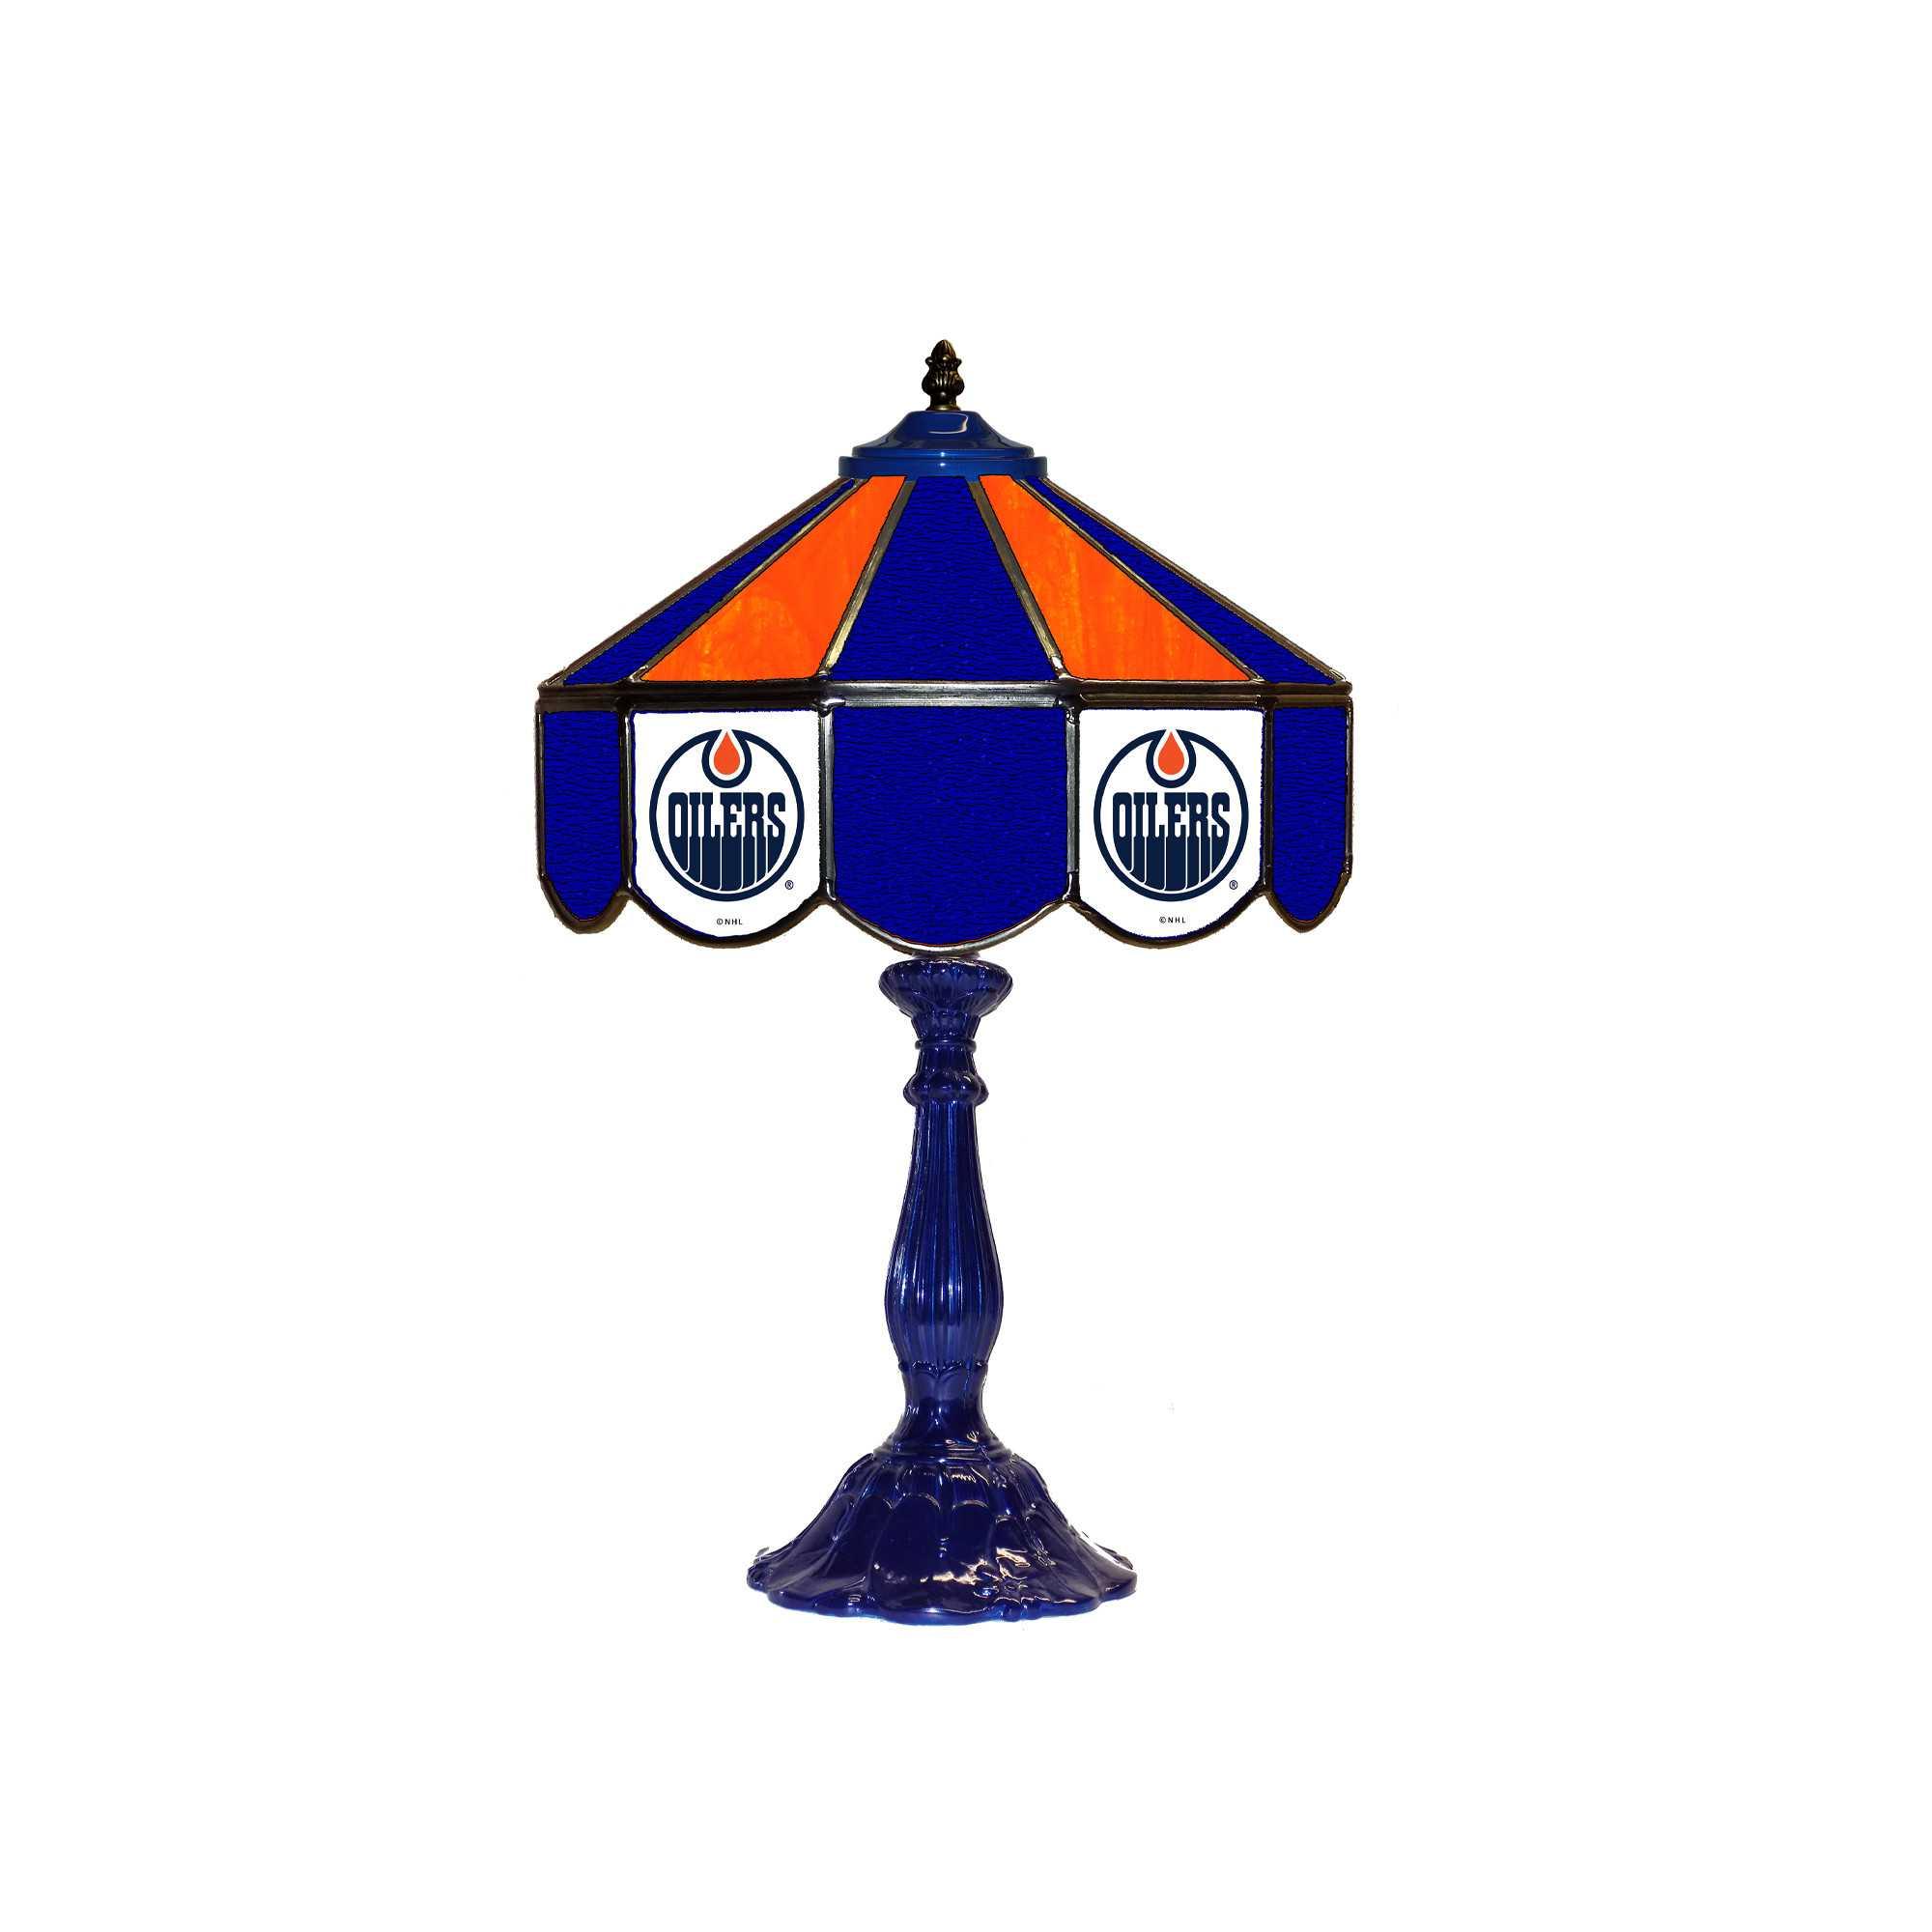 "EDMONTON OILERS 21"" GLASS TABLE LAMP"